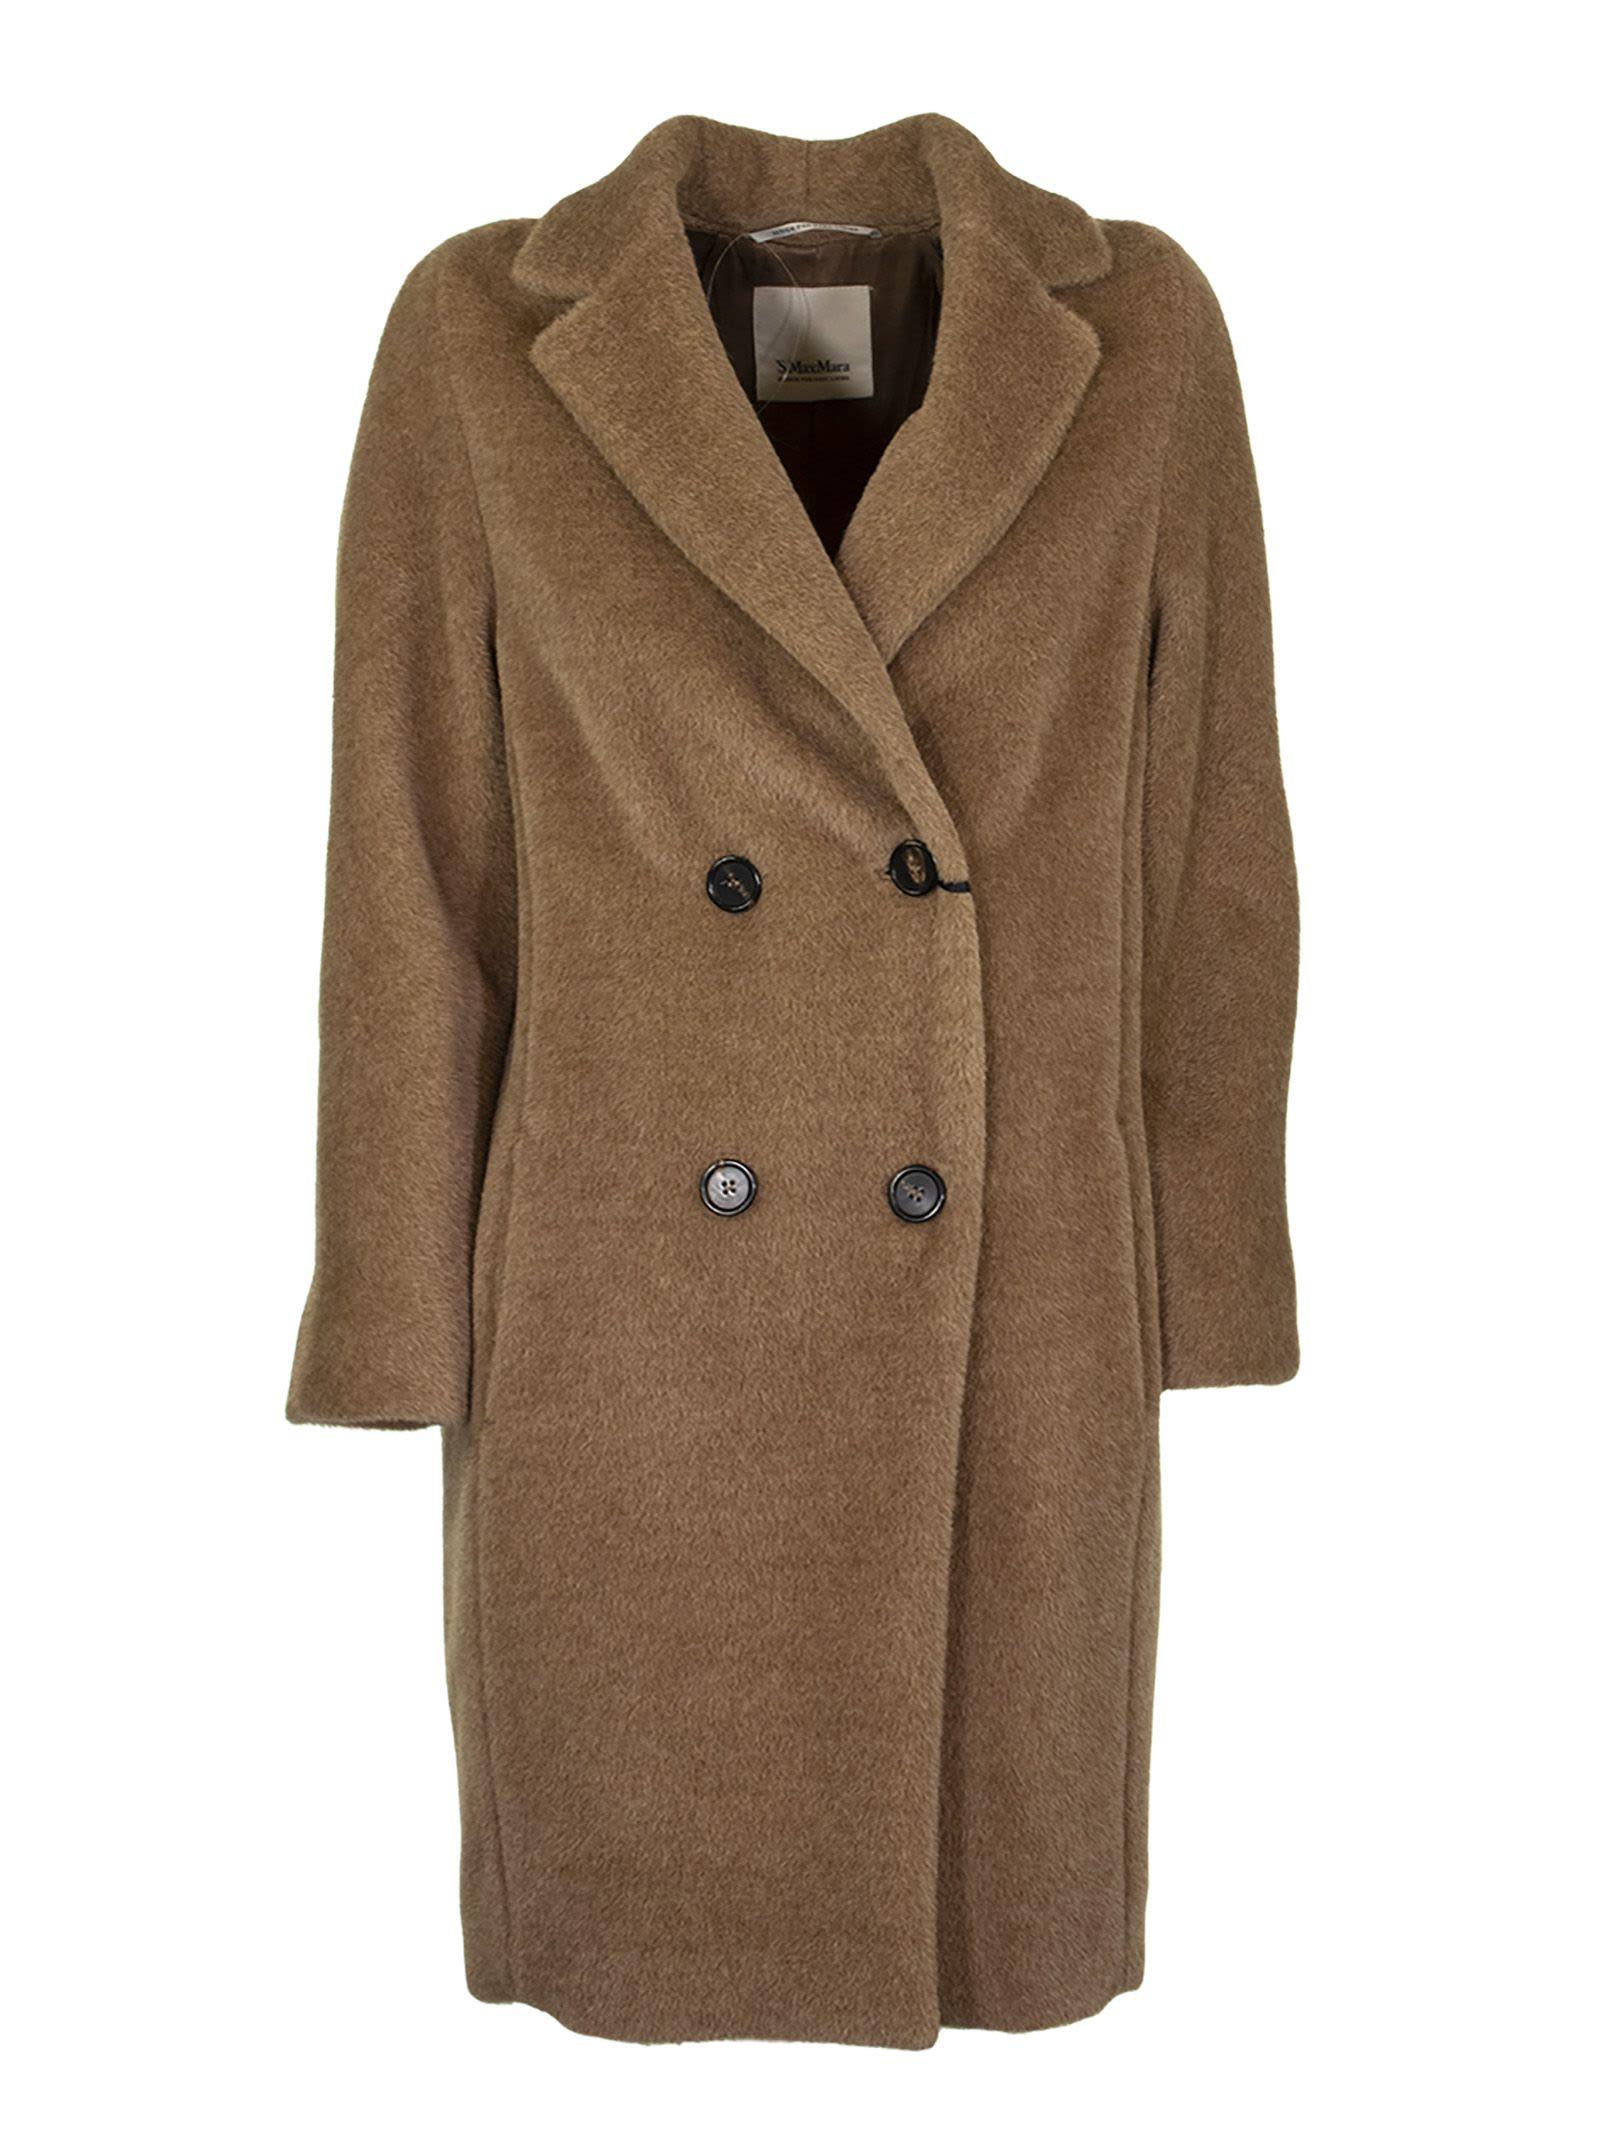 Max Mara Double-breasted Coat In Alpaca Blend